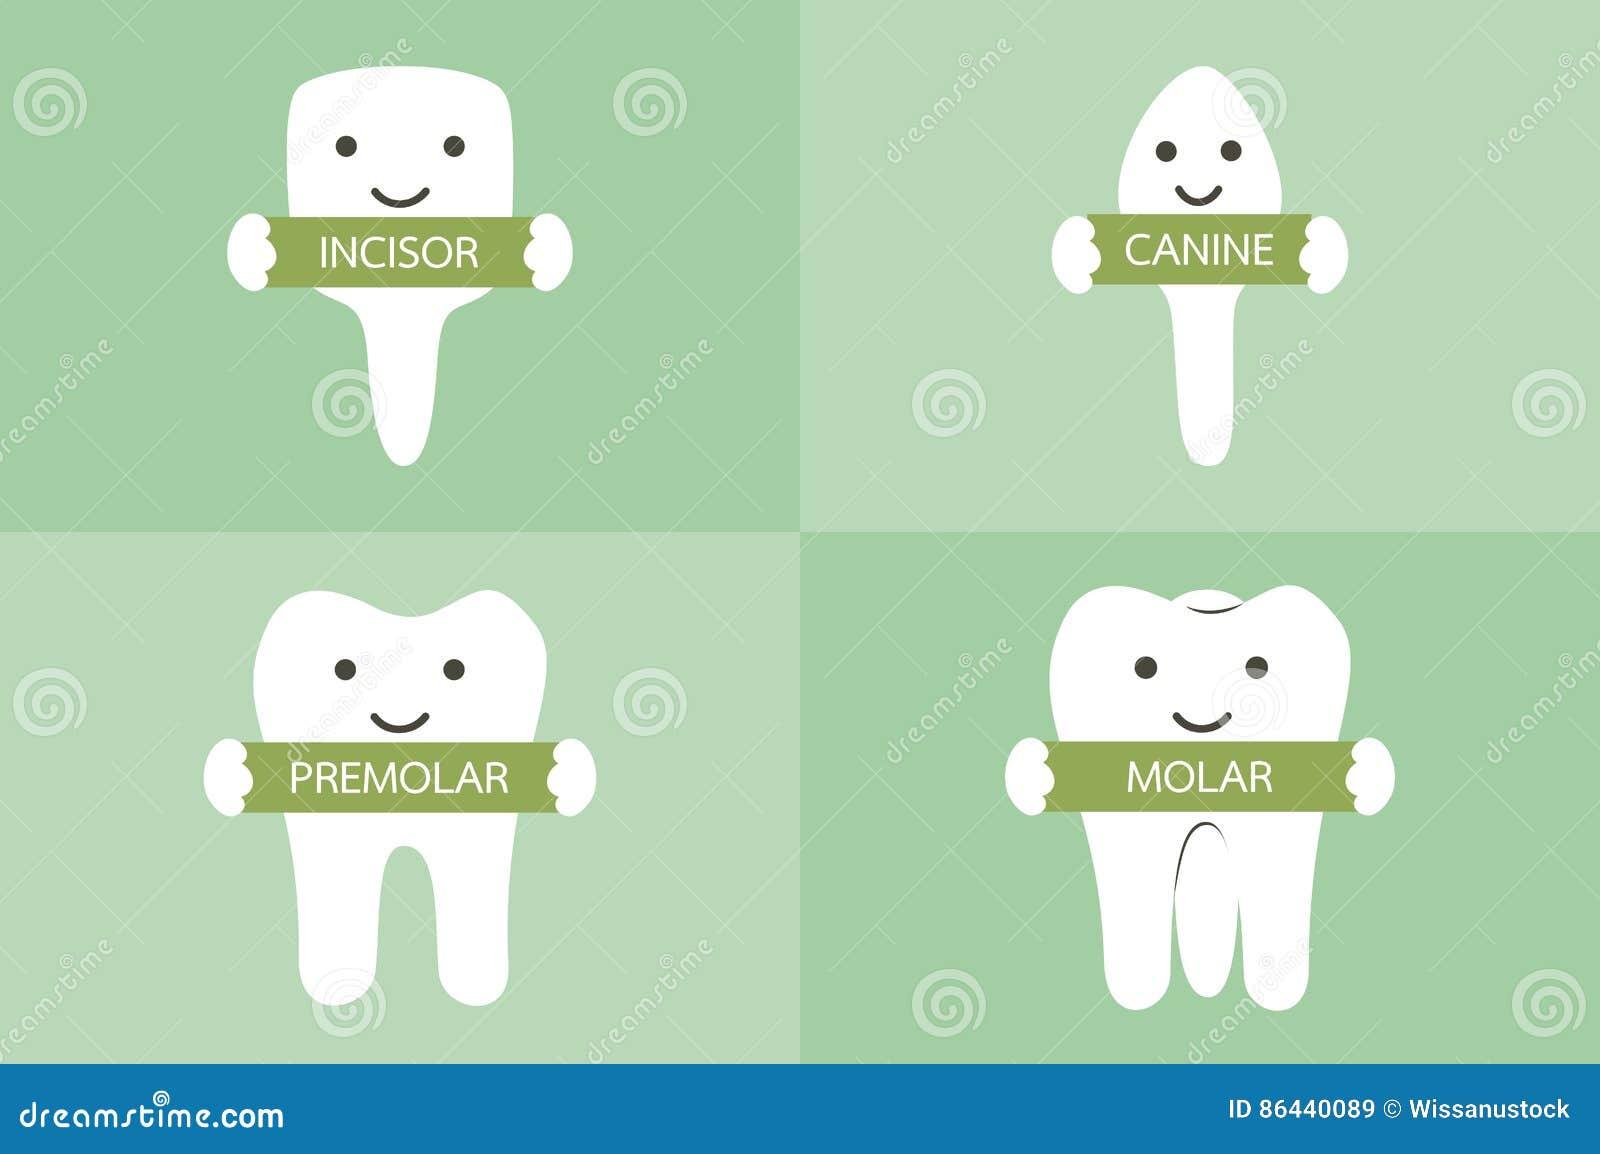 Tooth type - incisor, canine, premolar, molar